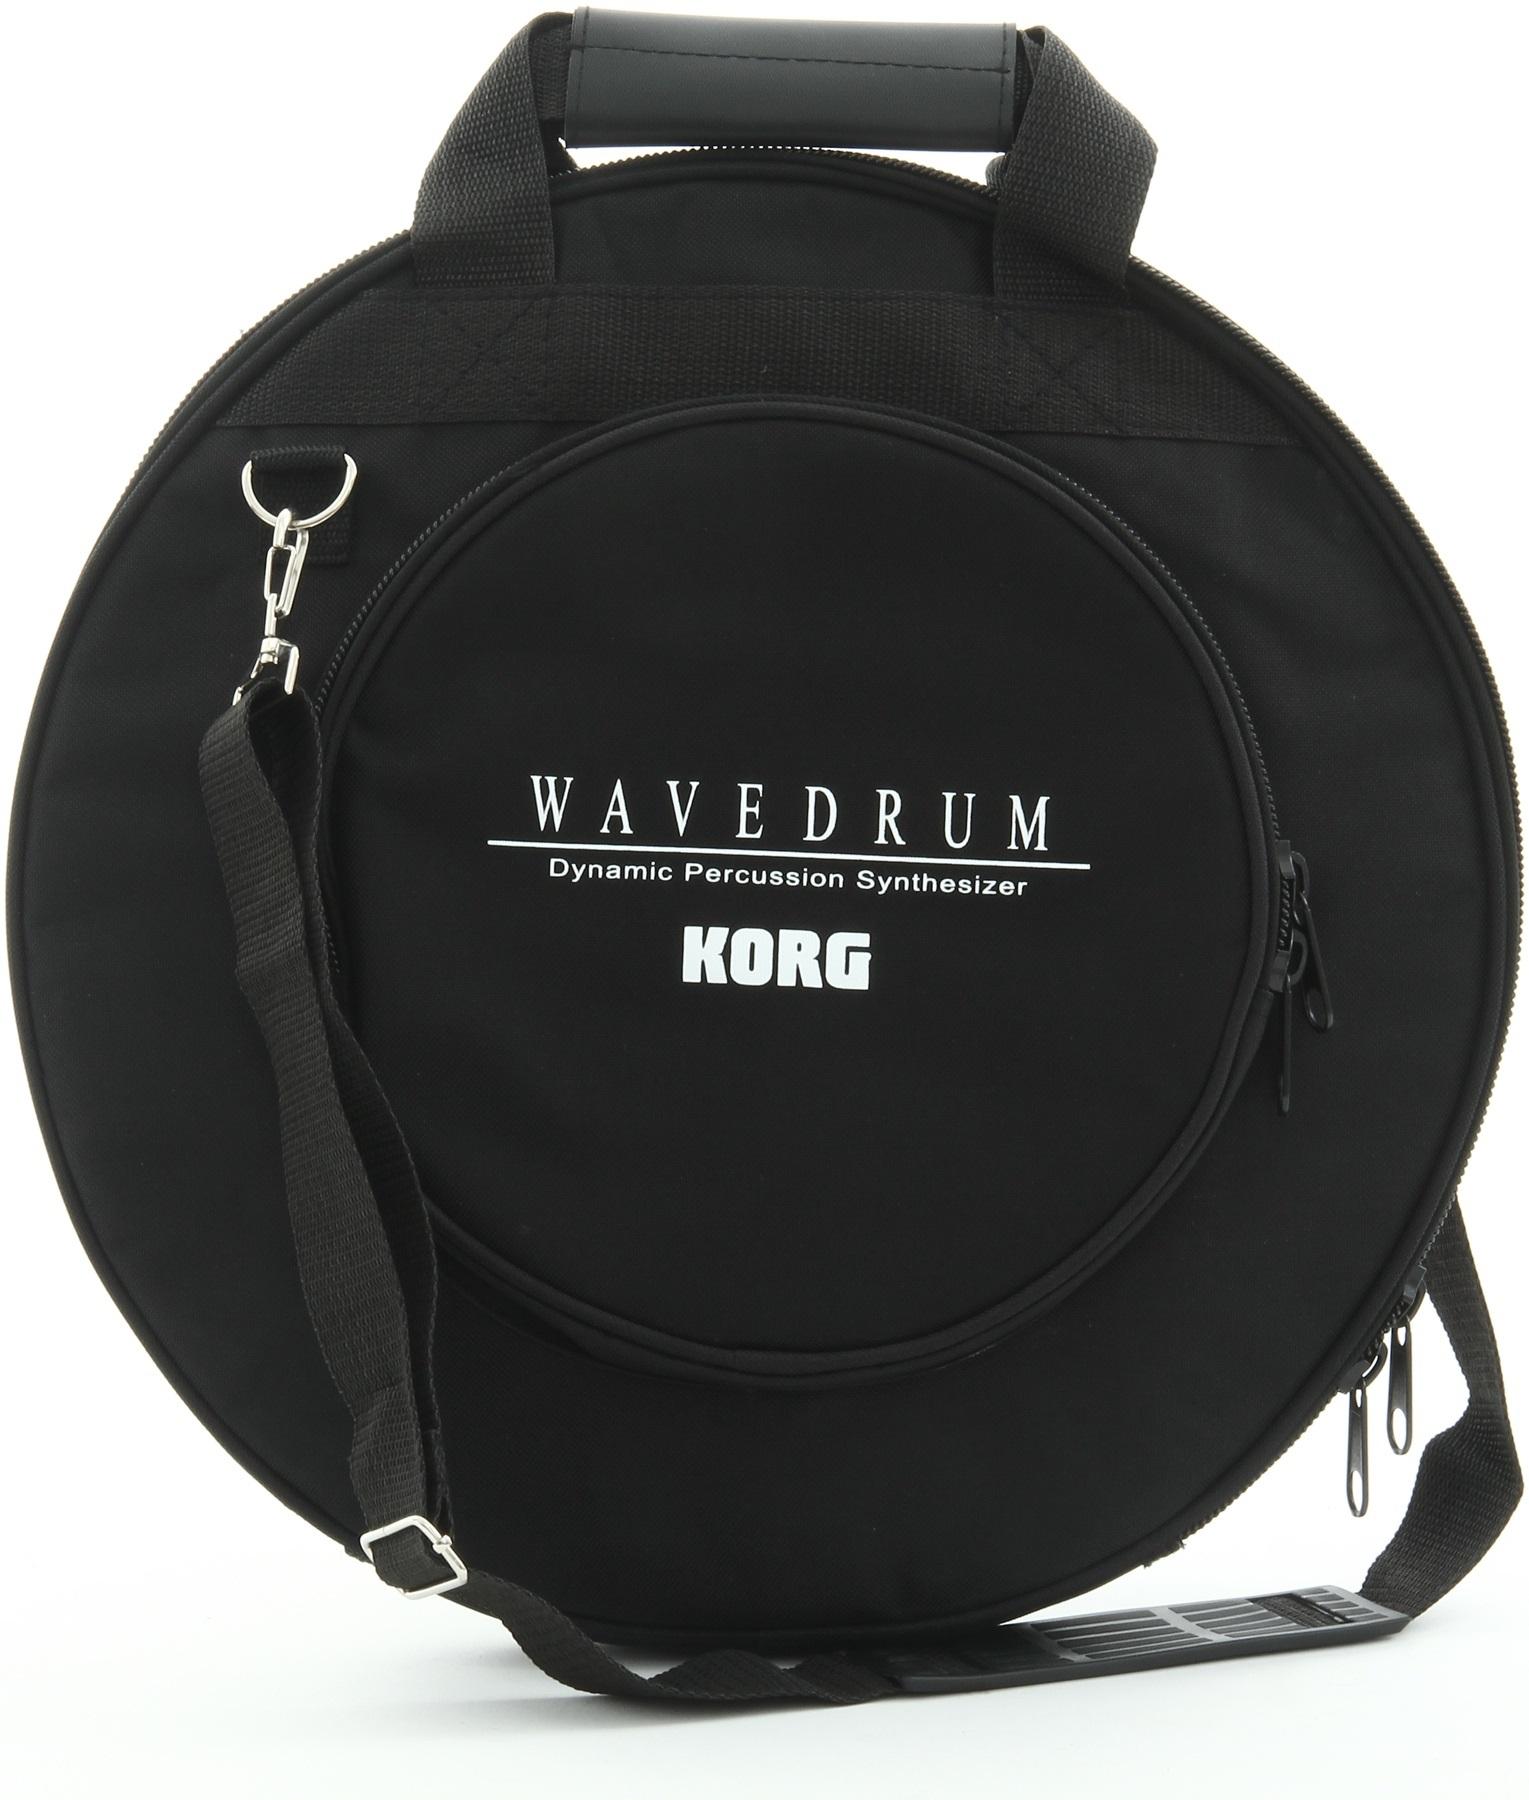 Korg Wavedrum Bag